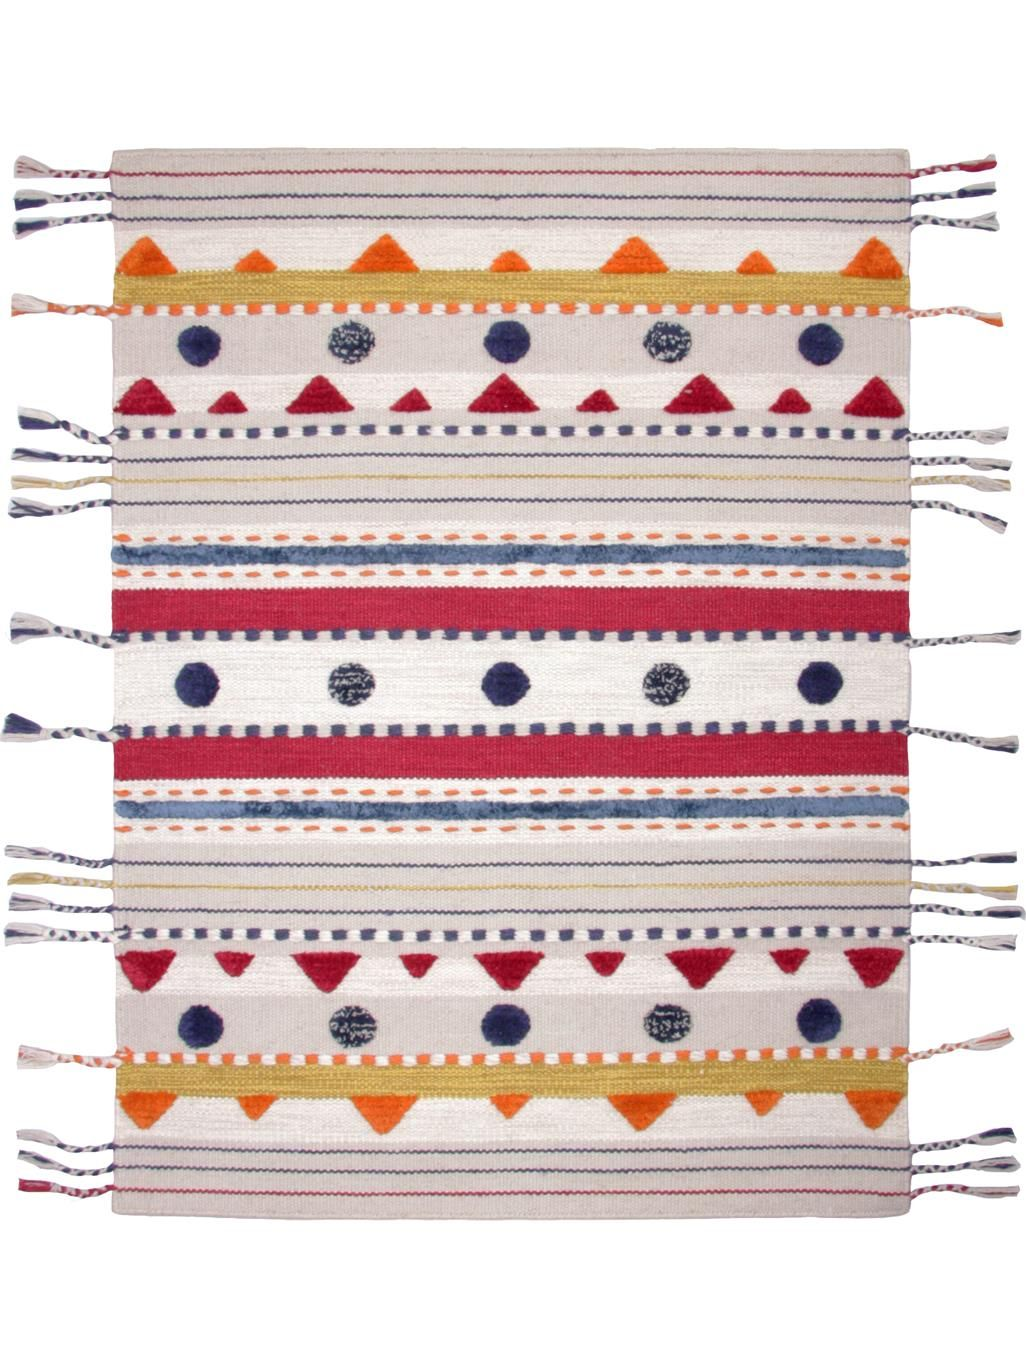 kinderteppich tribal benuta teppich interior kinderteppich kinderteppiche pinterest. Black Bedroom Furniture Sets. Home Design Ideas